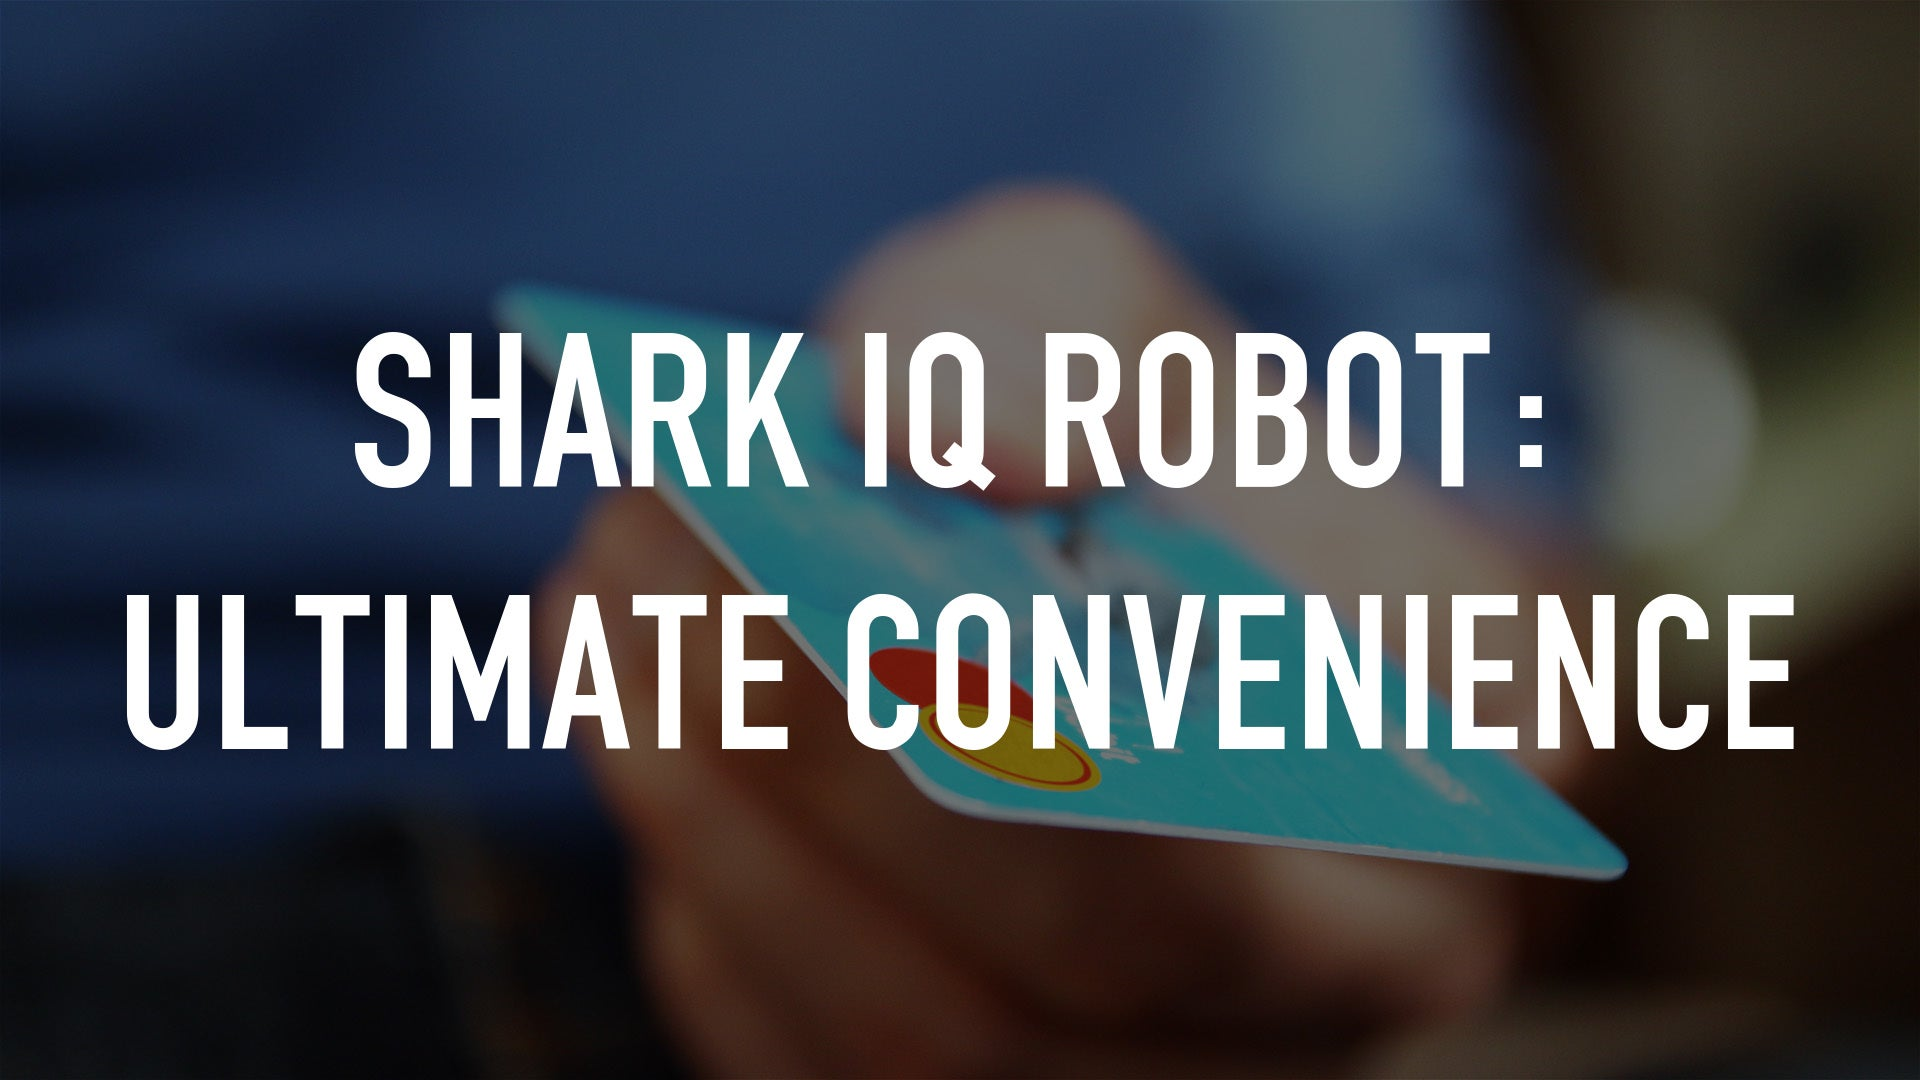 Shark IQ Robot: Ultimate Convenience